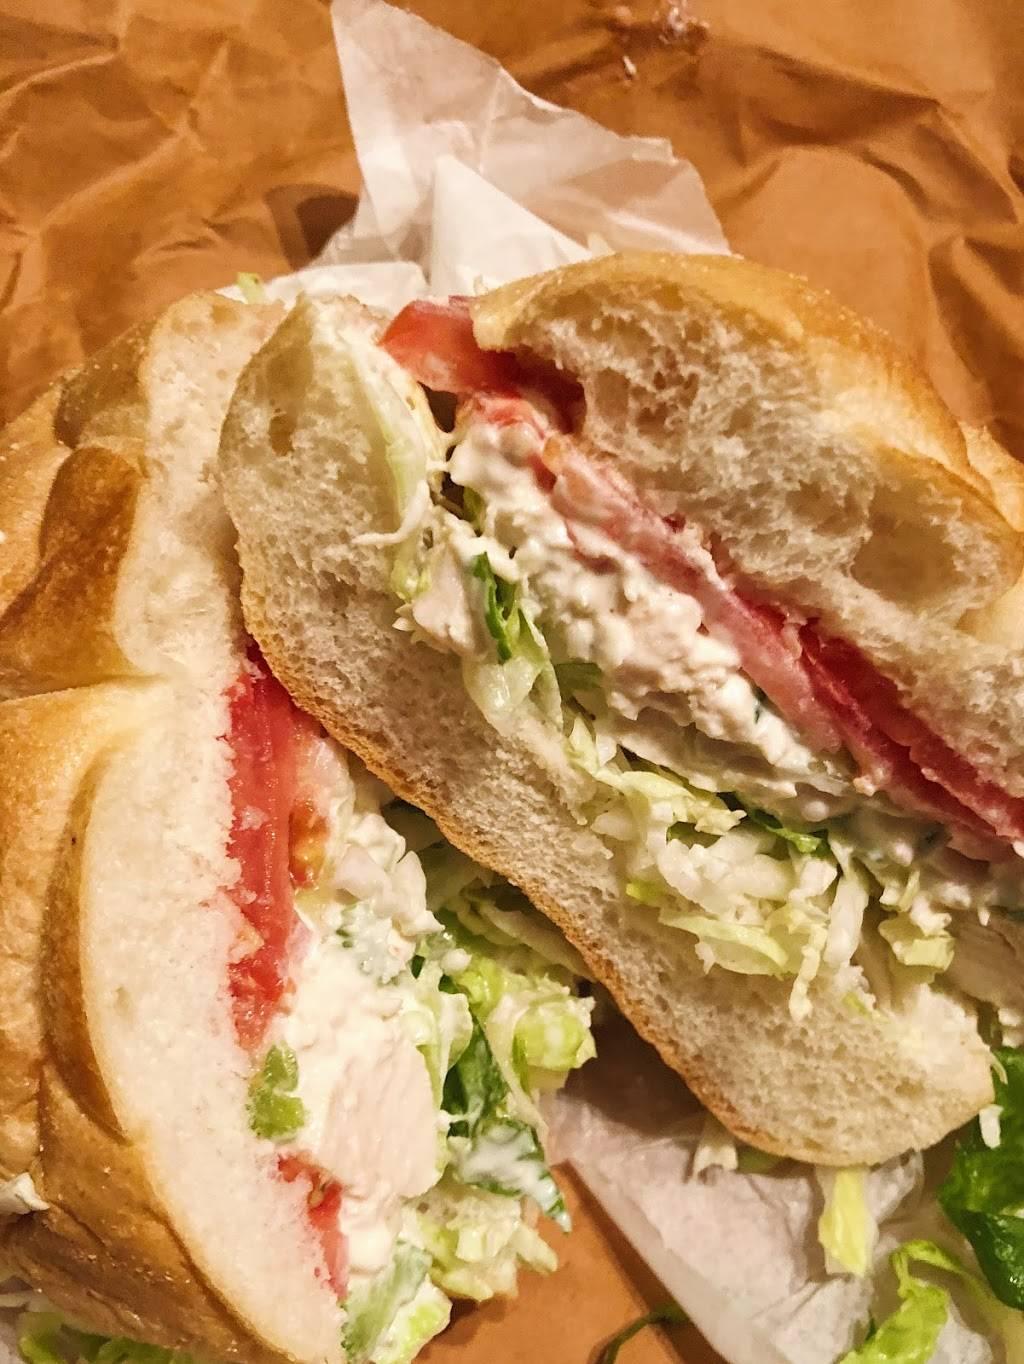 Sunny & Annies Deli | restaurant | 94 Avenue B, New York, NY 10009, USA | 2126773131 OR +1 212-677-3131